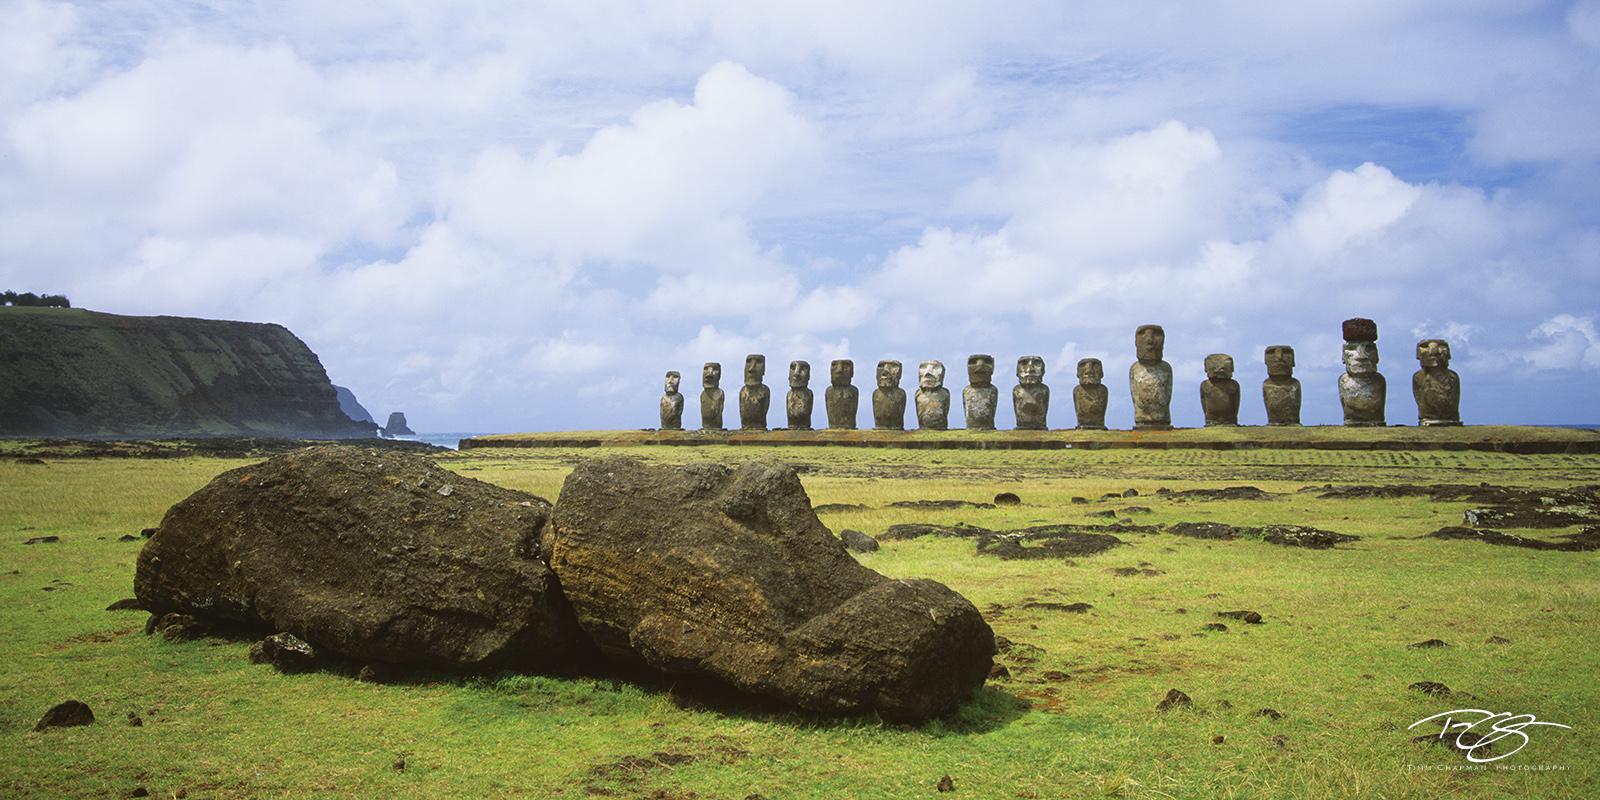 rapa nui, easter island, panorama, clouds, isla de pascua, chile, moai, stone statues, giant heads, pop culture, hand carved heads, giant faces, long ears, short ears, ahu tongariki, photo